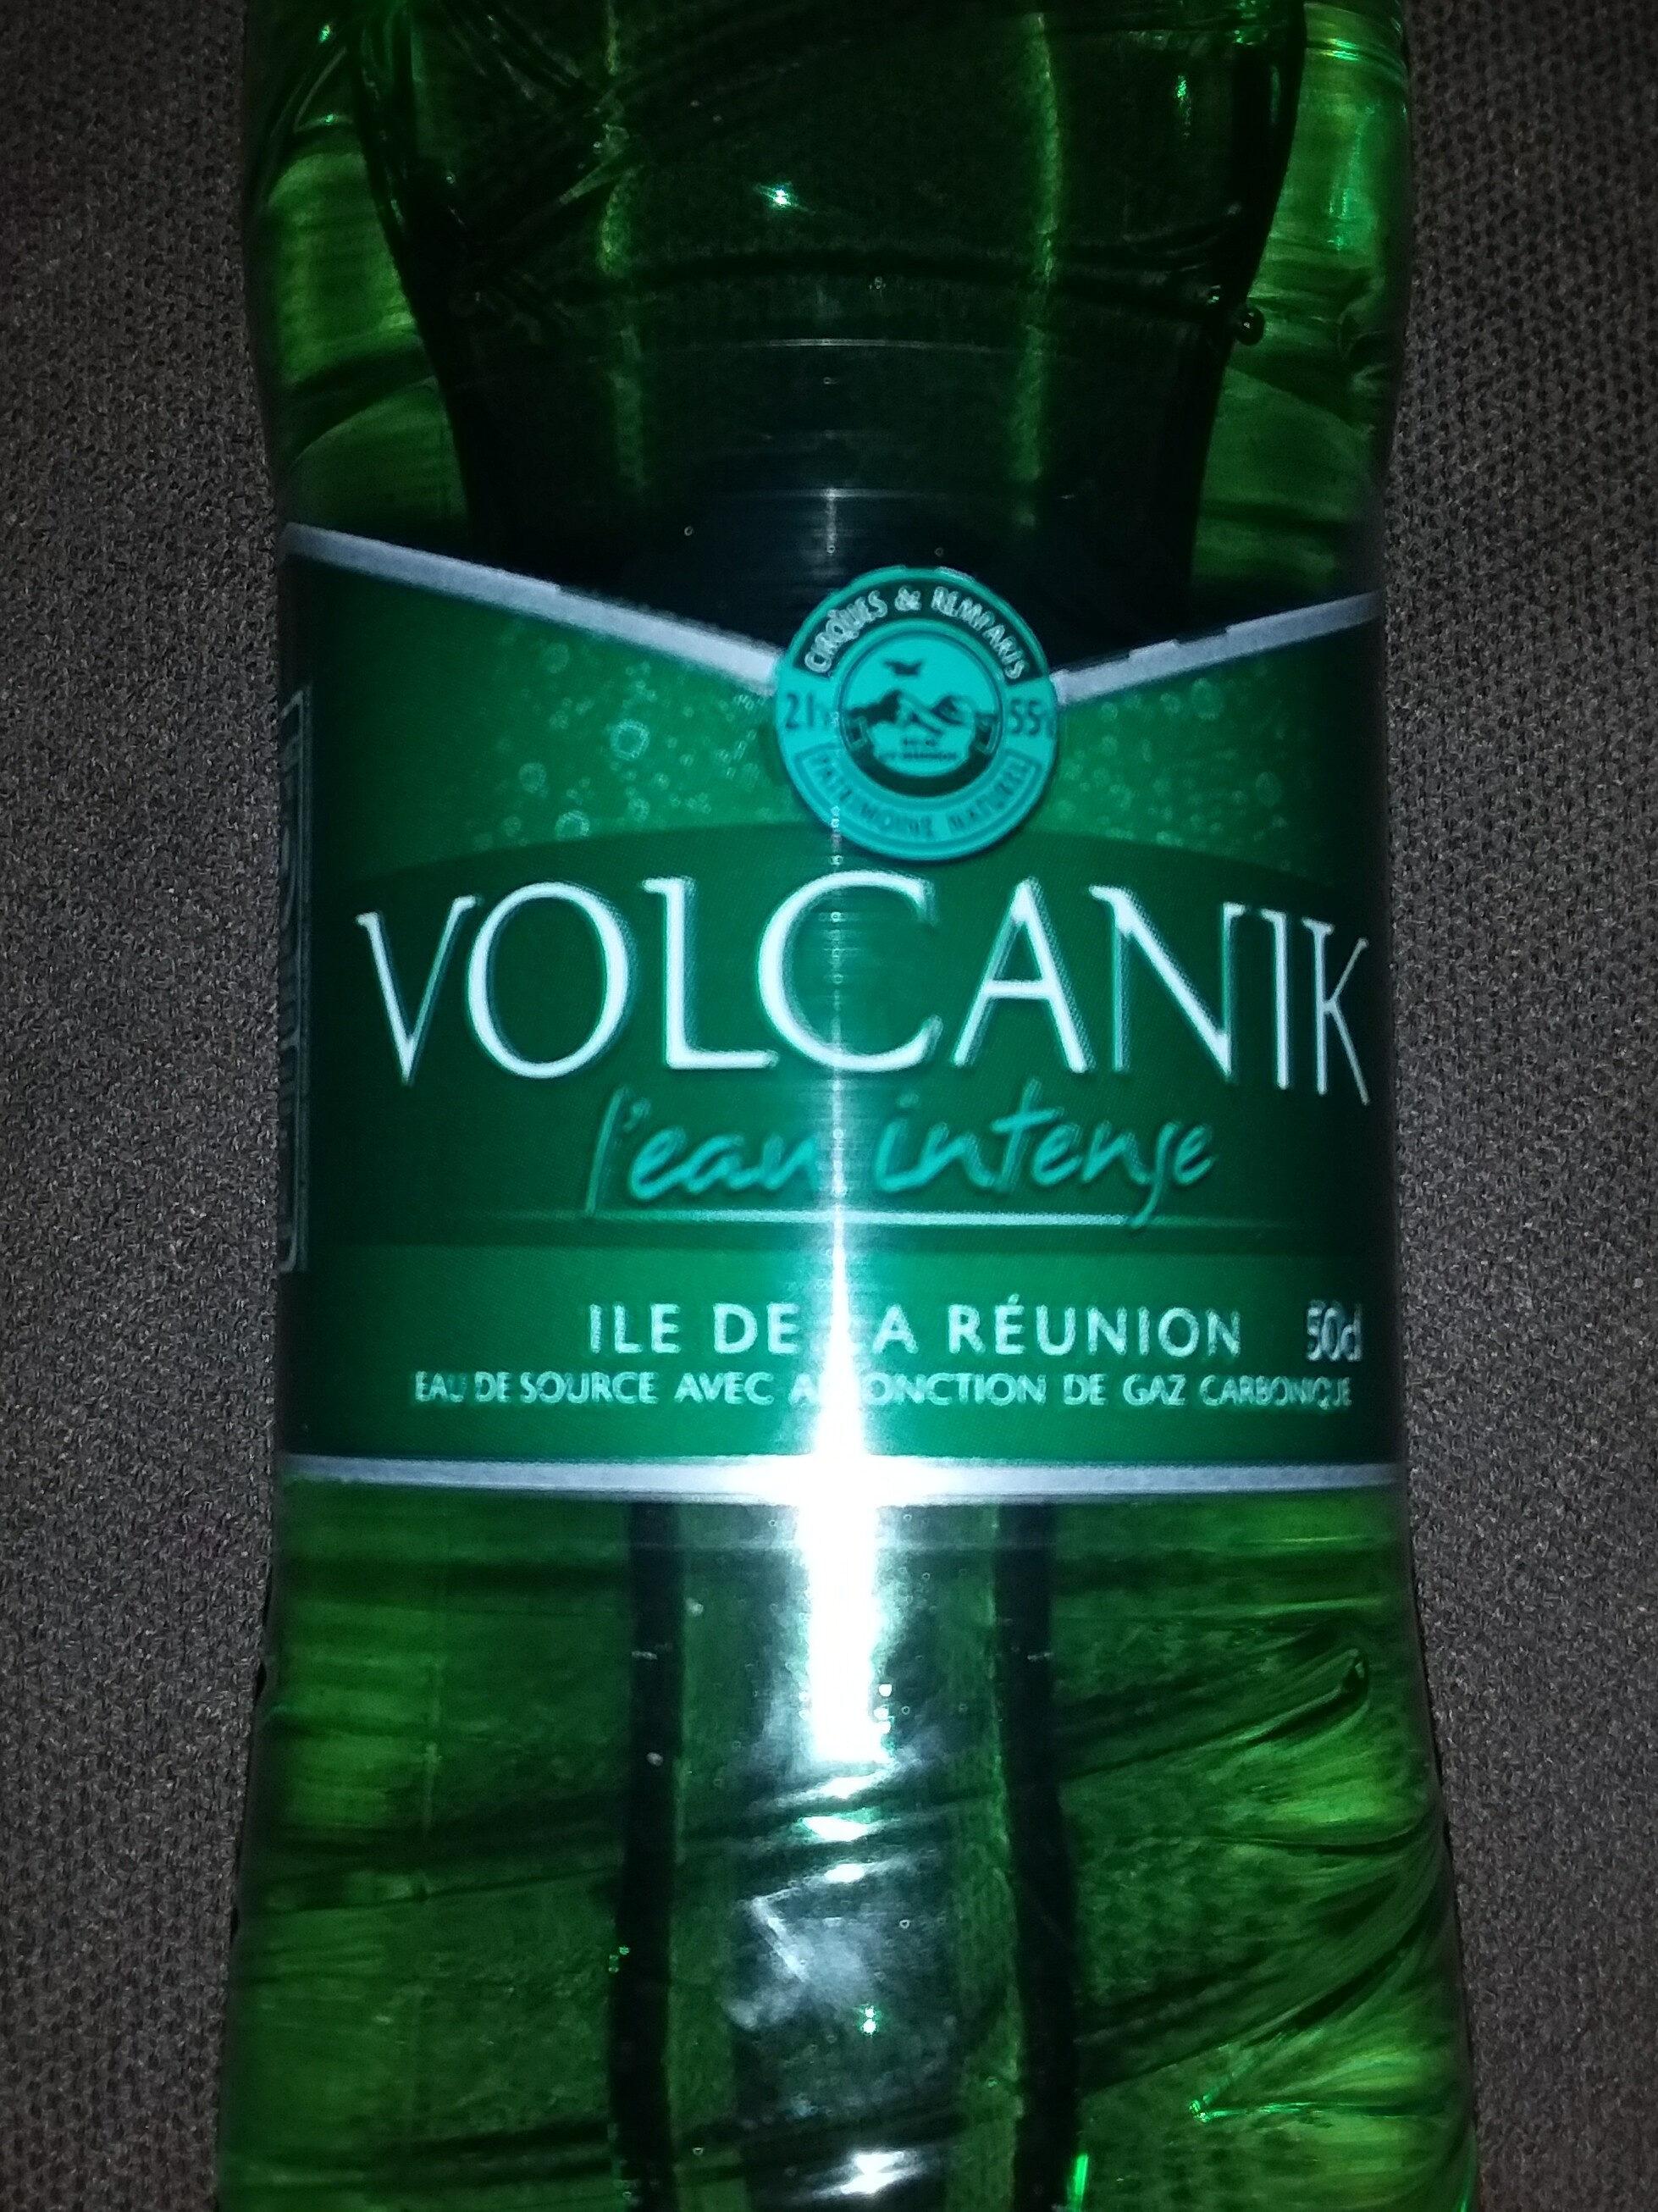 Volcanik - Product